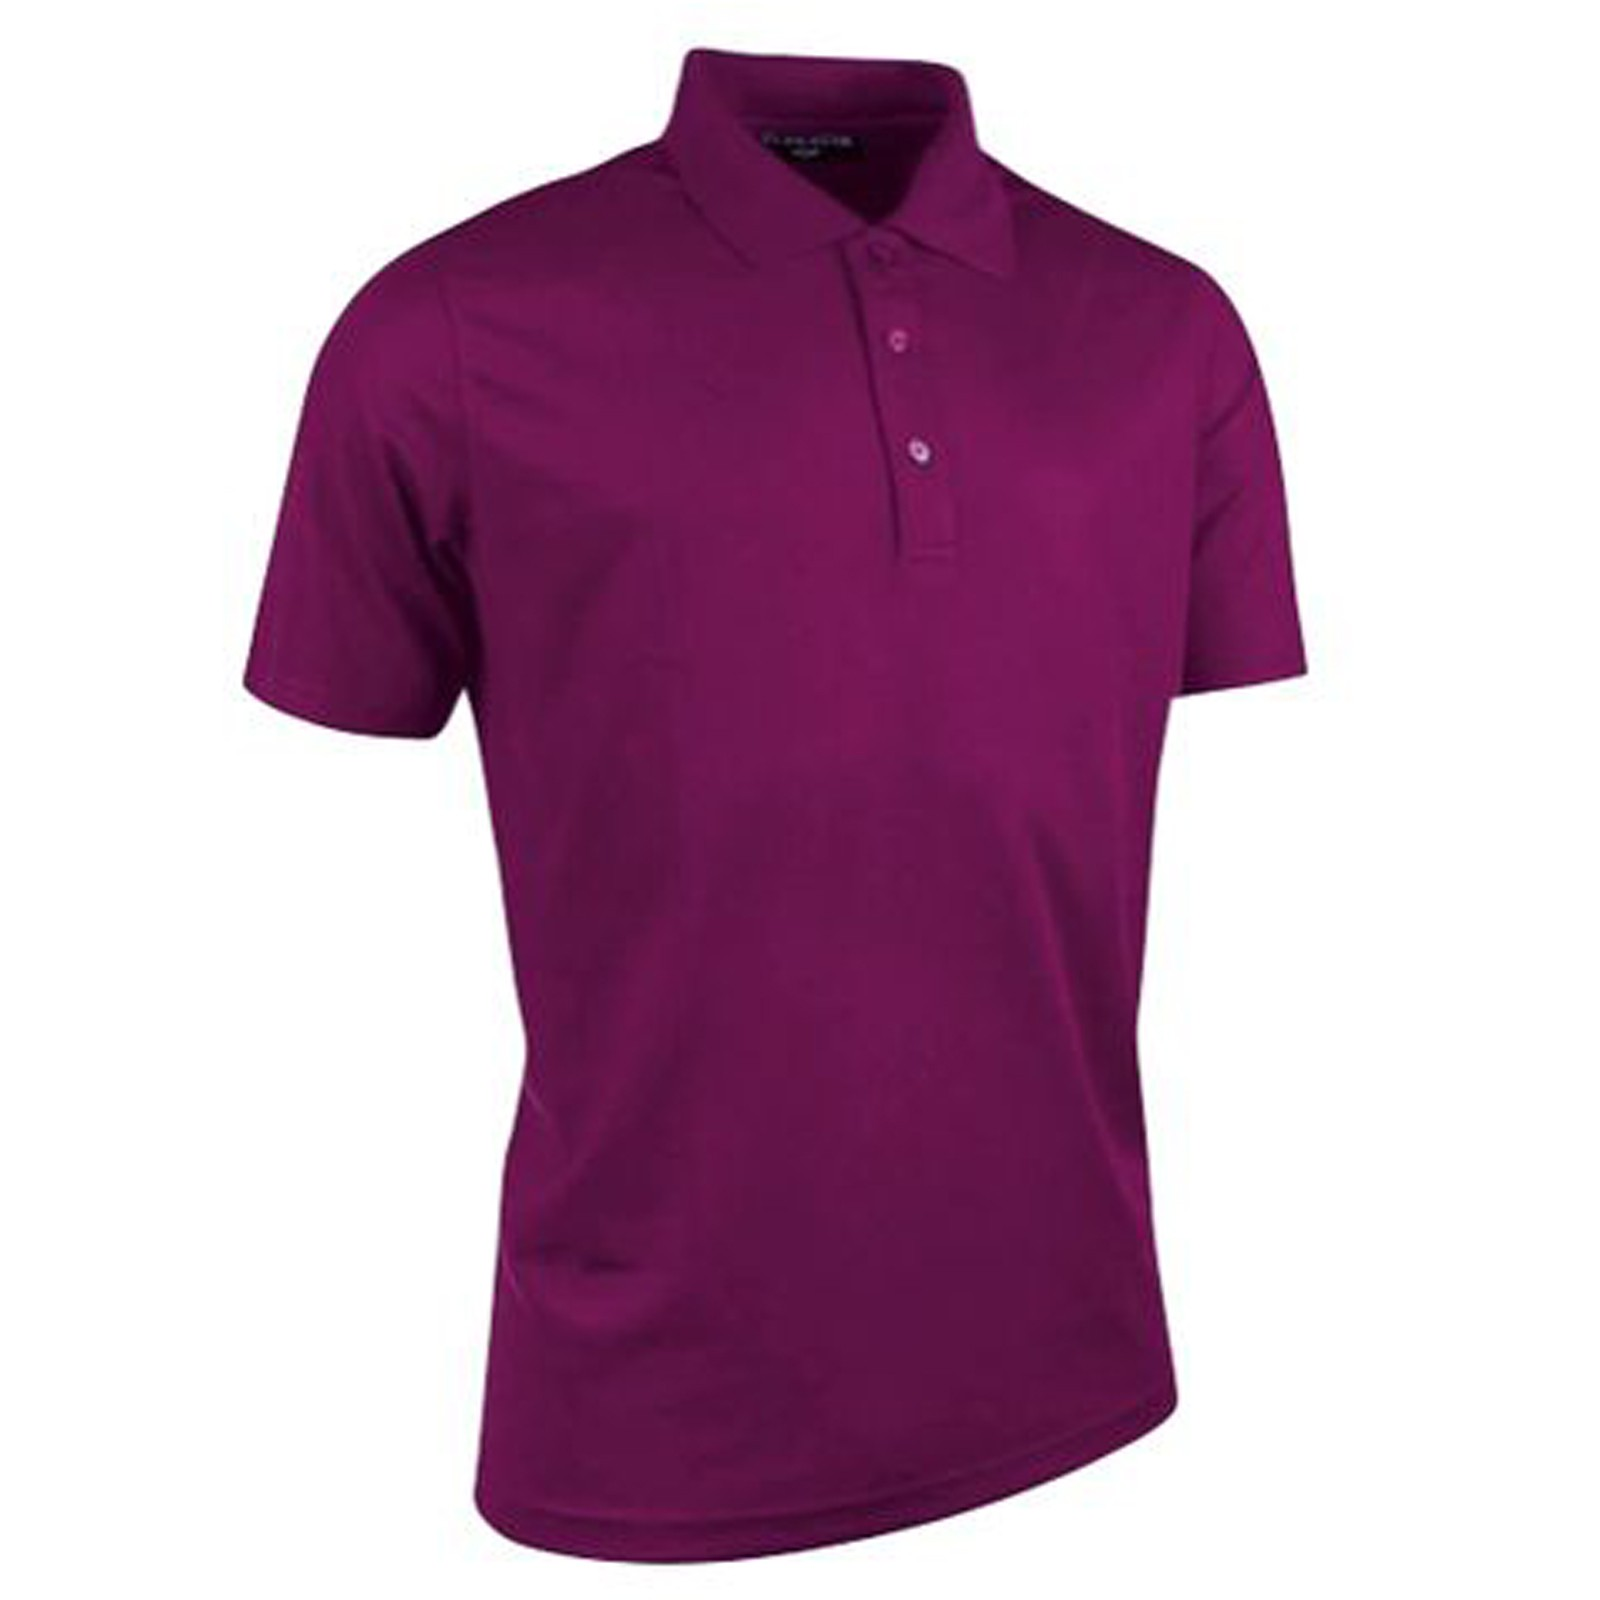 Glenmuir Performance Pique Plain Polo Shirts